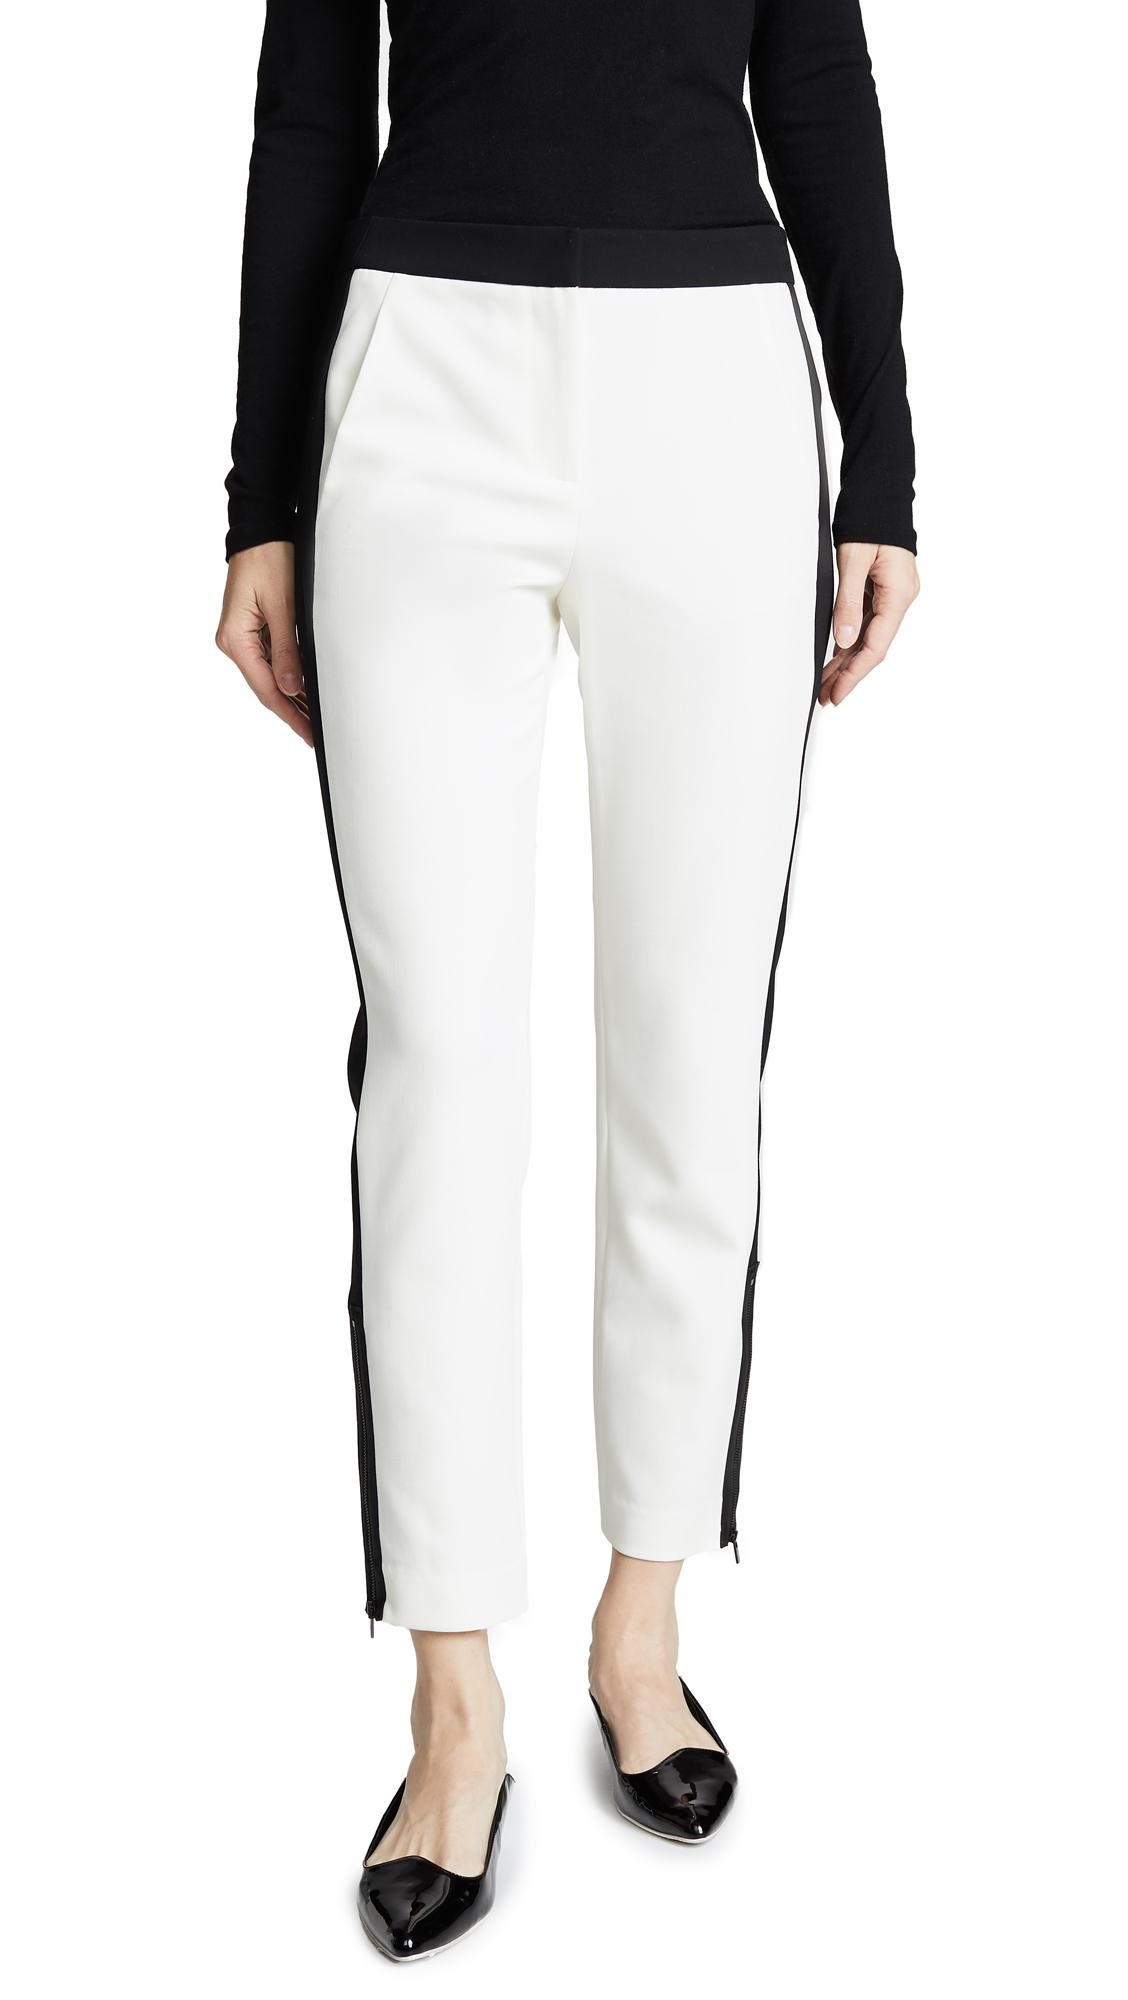 Tibi Skinny Tuxedo Pants - Ivory